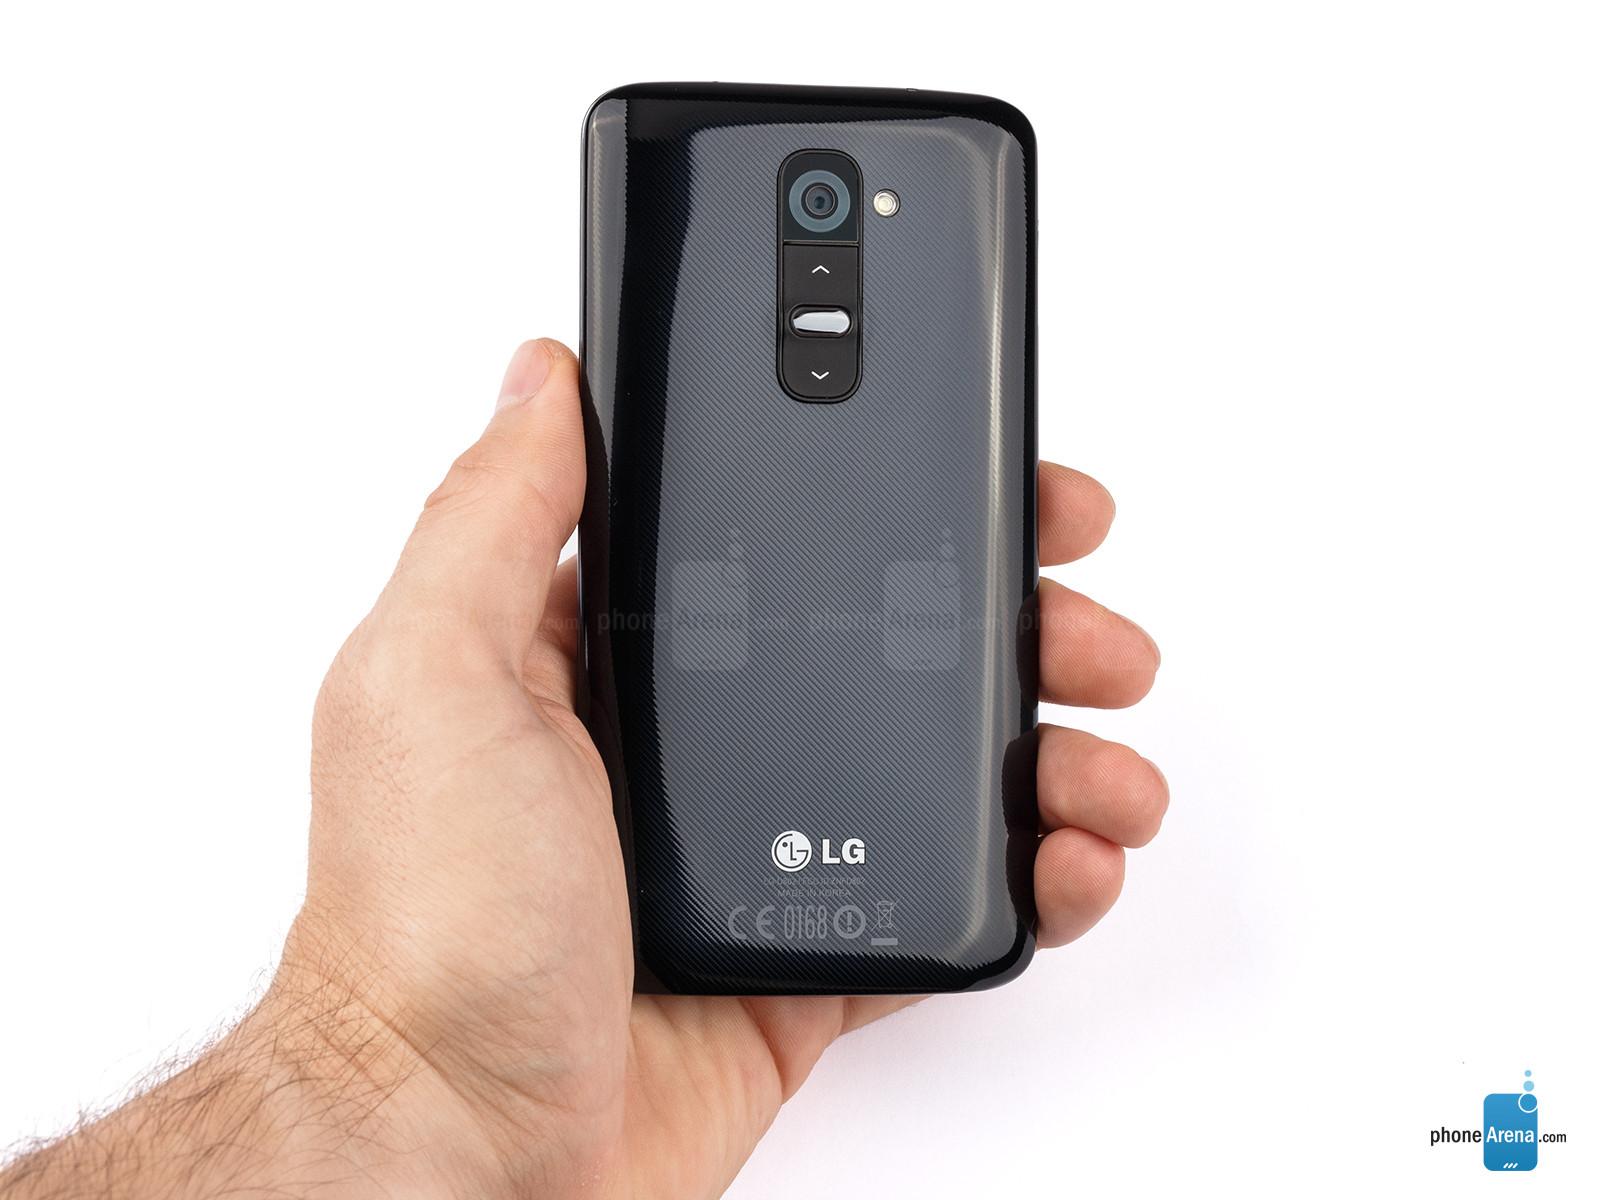 LG-2-images